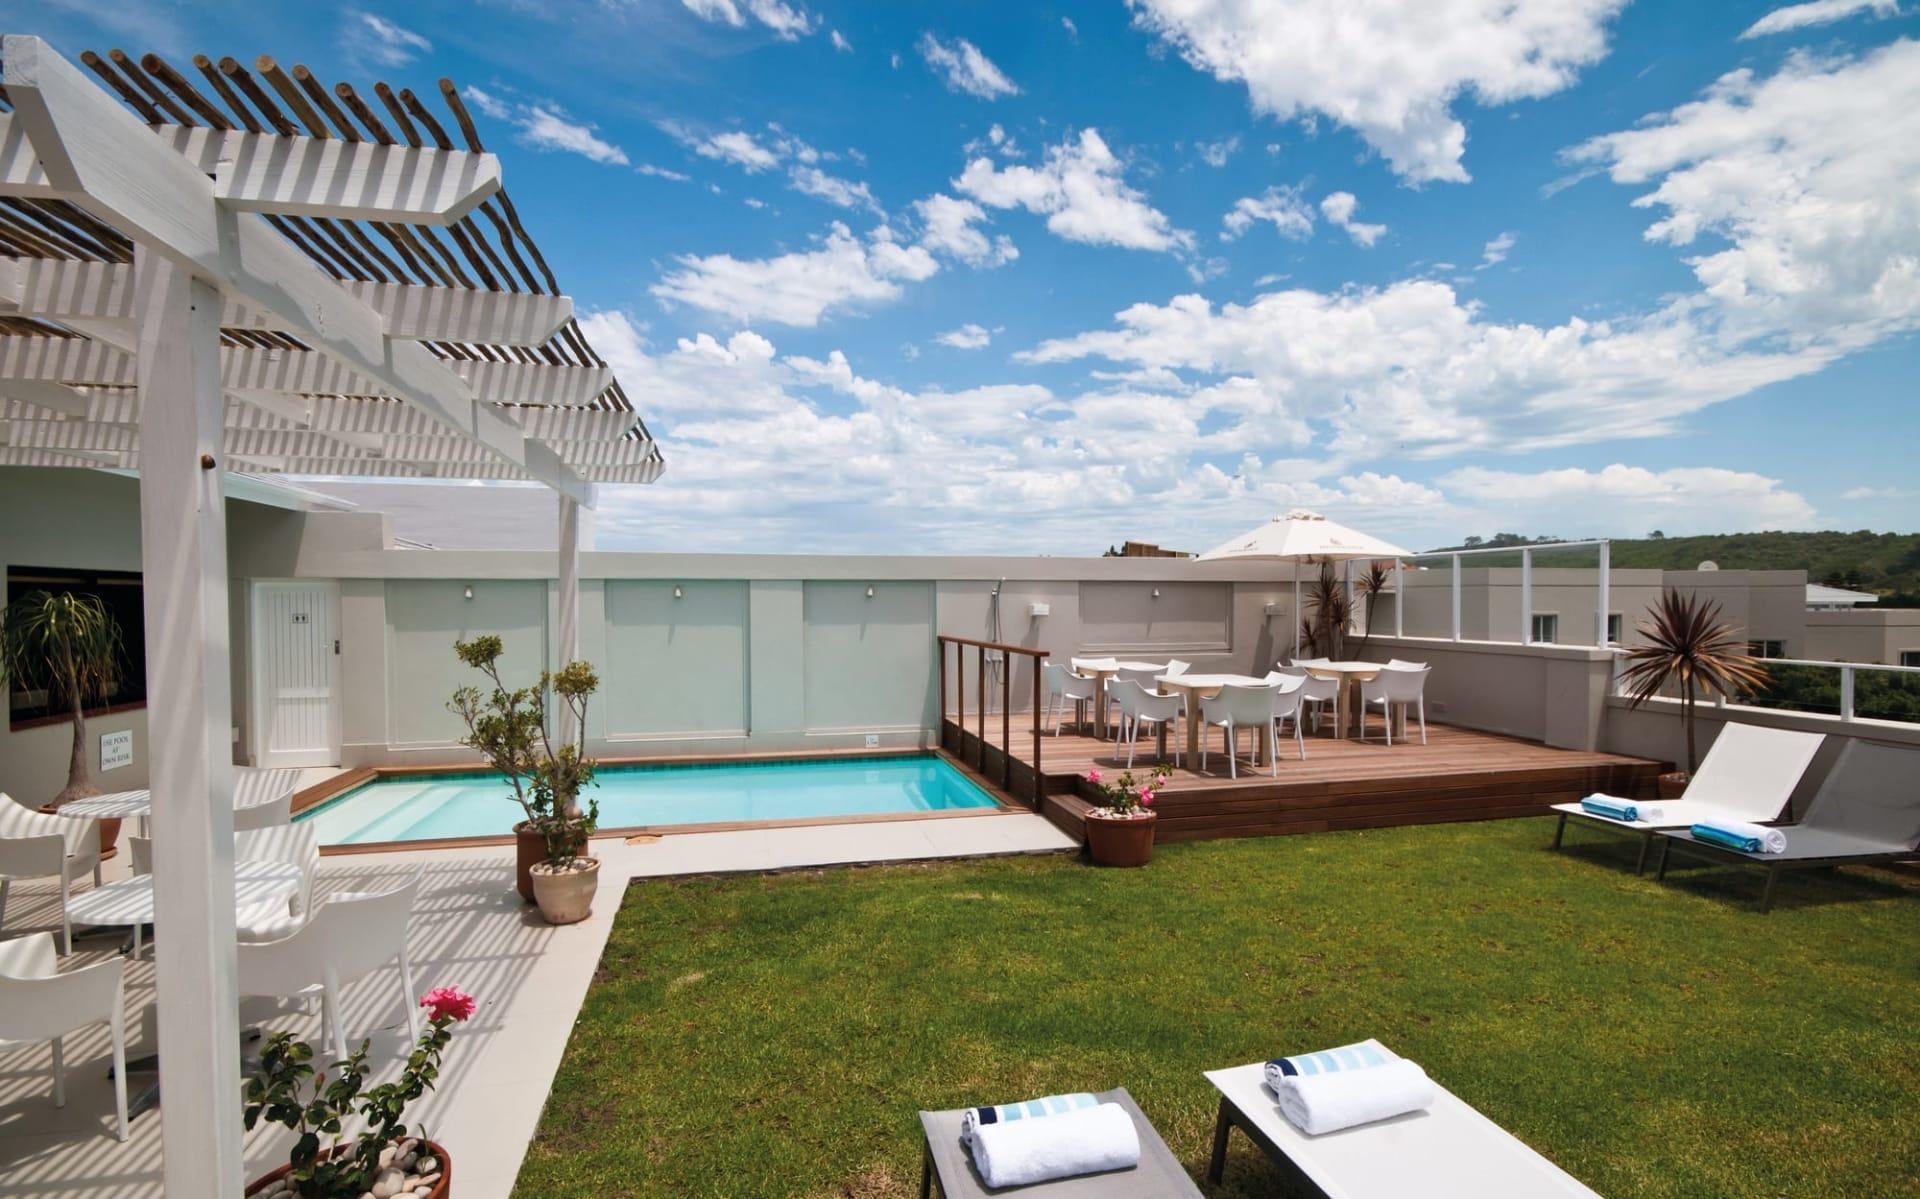 The Robberg Beach Lodge in Plettenberg Bay: pool The Robberg Beach Lodge - Pool mit Liegestühlen im Garten